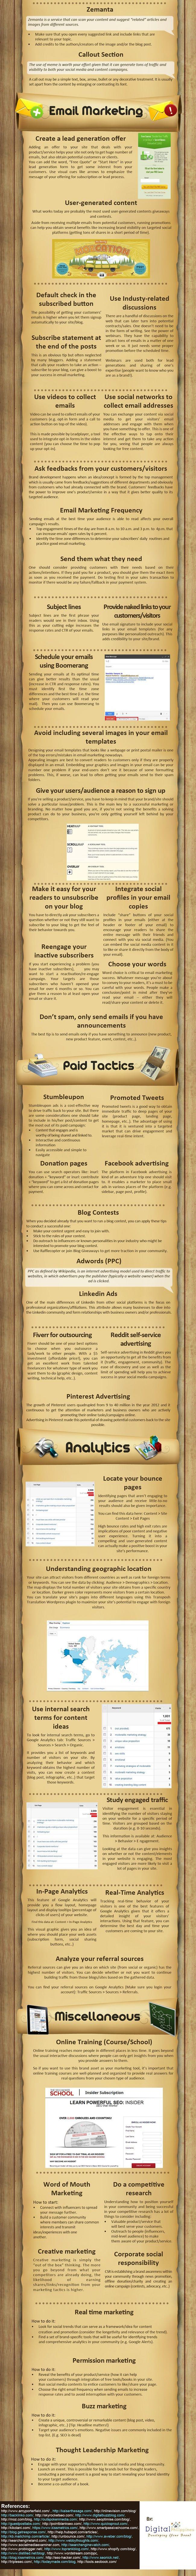 120 Marketing Tactics For New Blogs 2